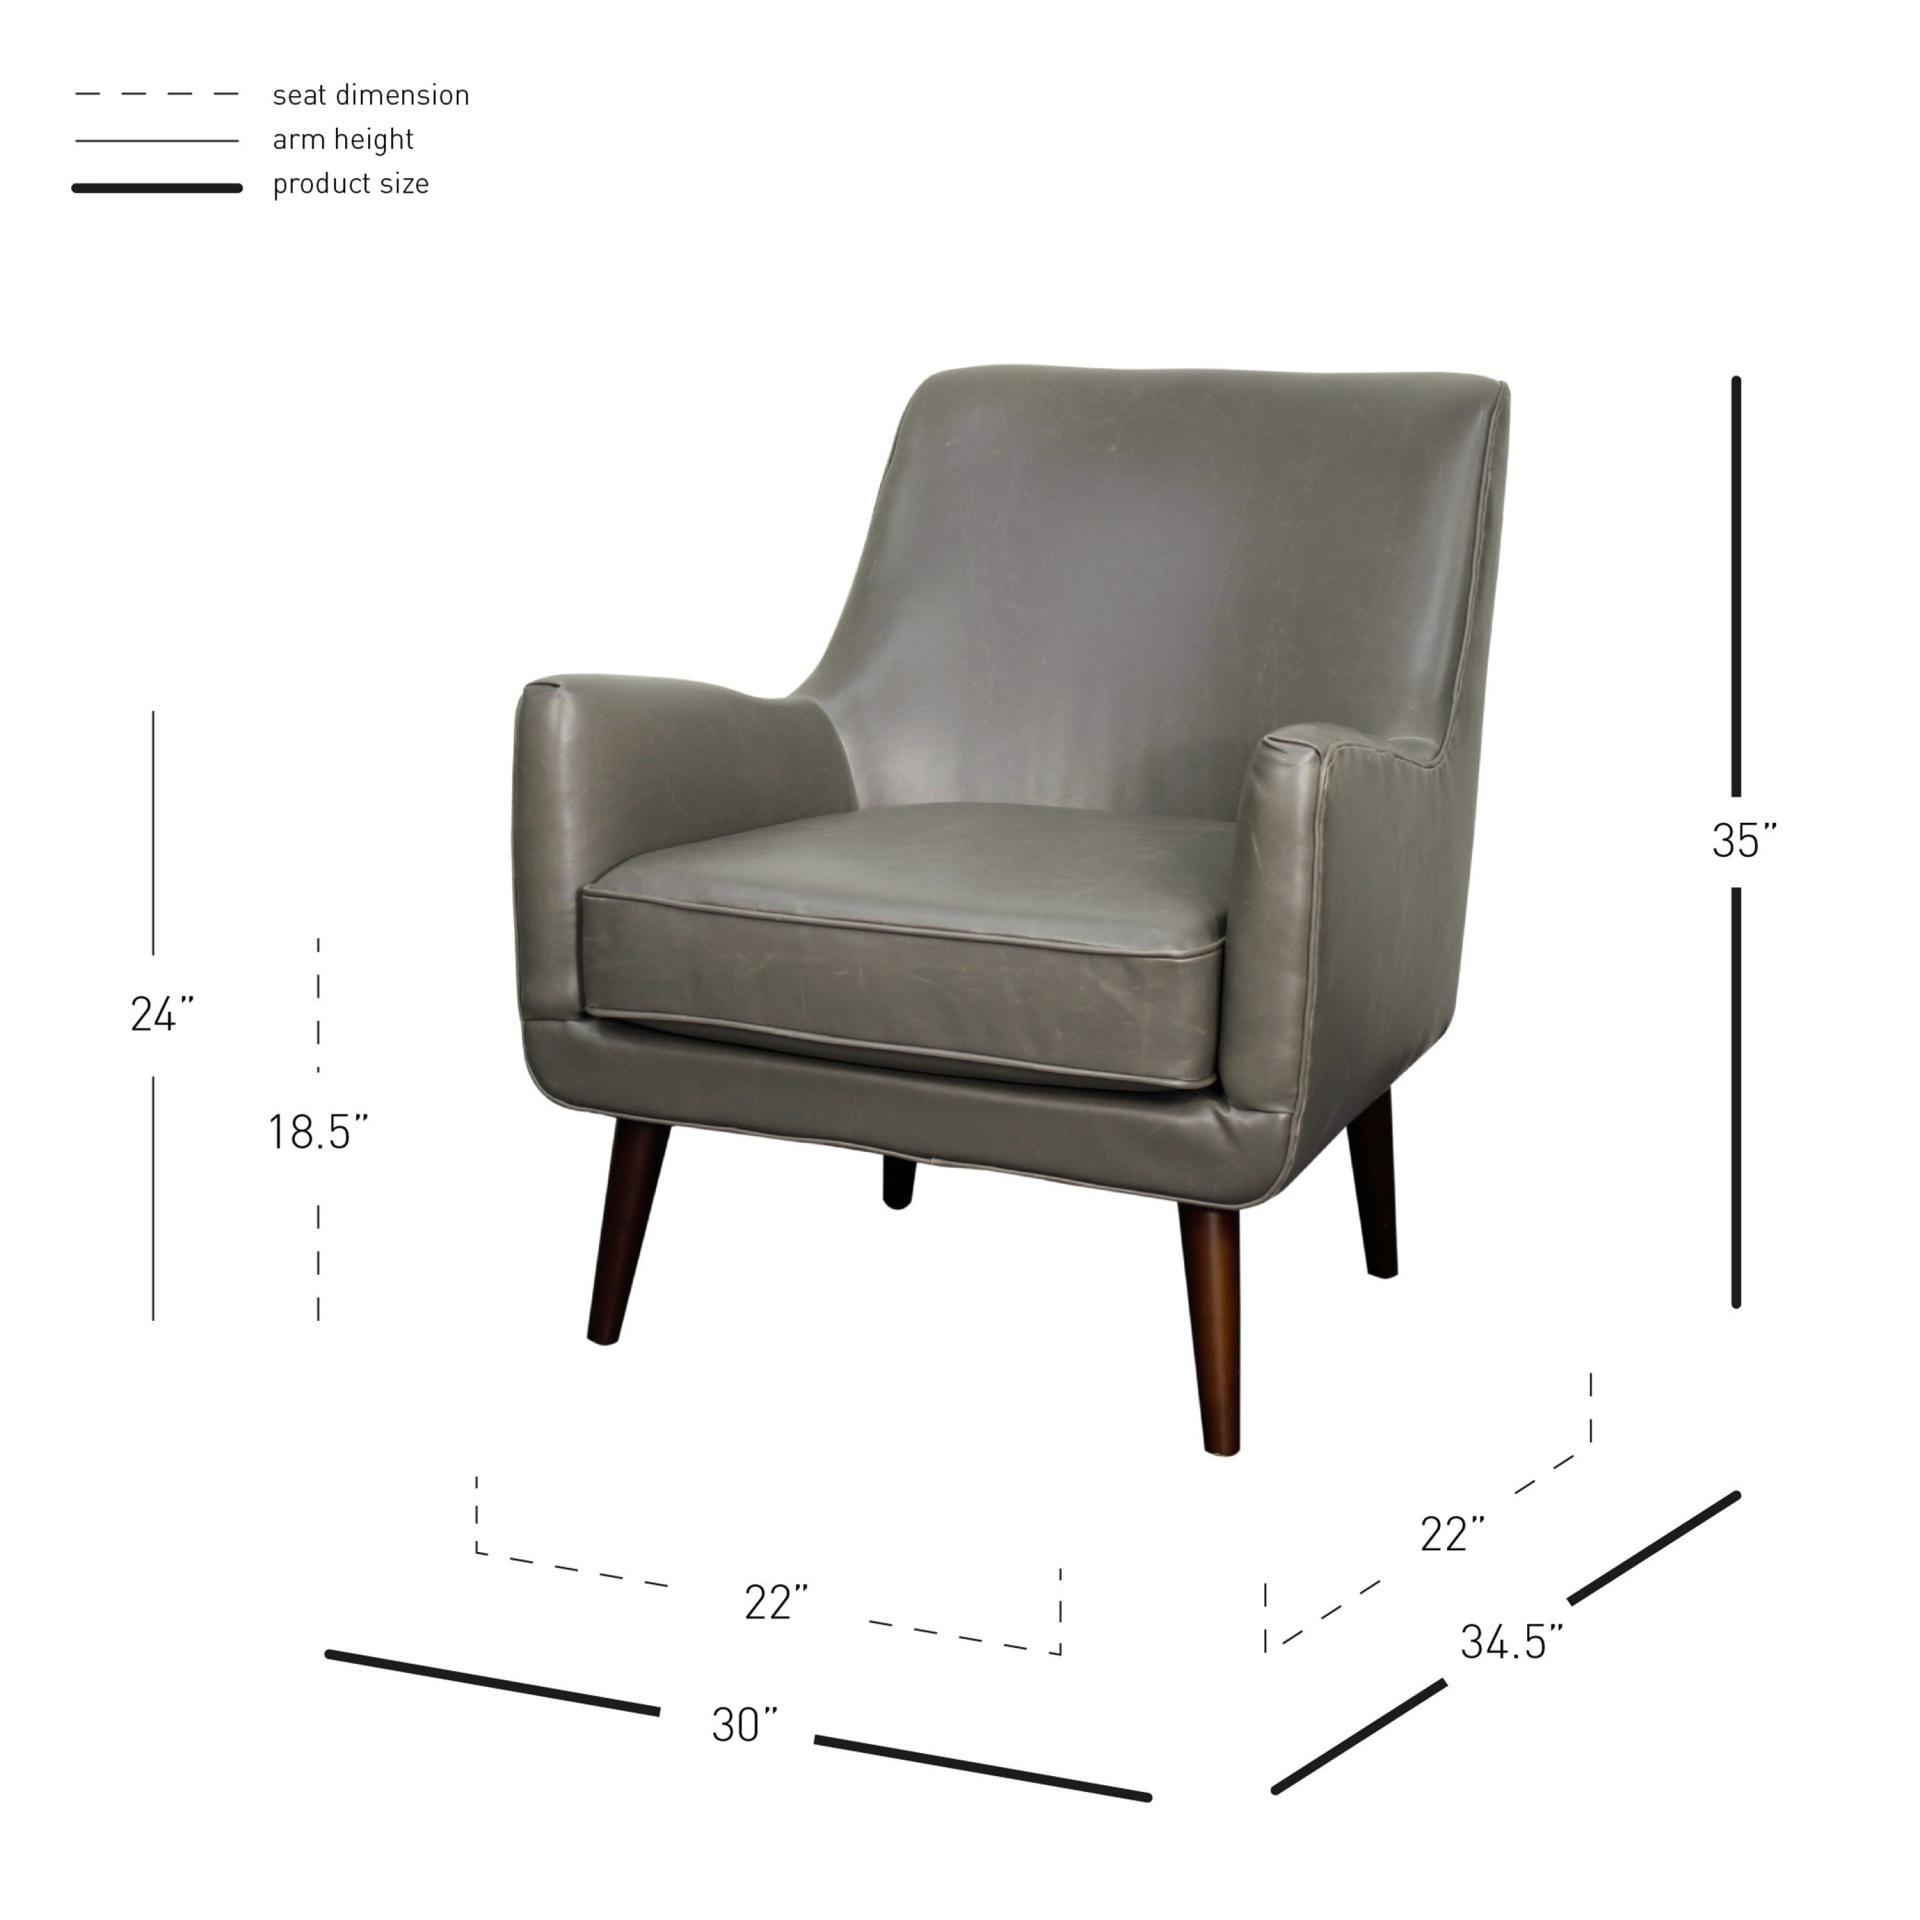 353235b V04 Br Npd Home Furniture Wholesale Lifestyle